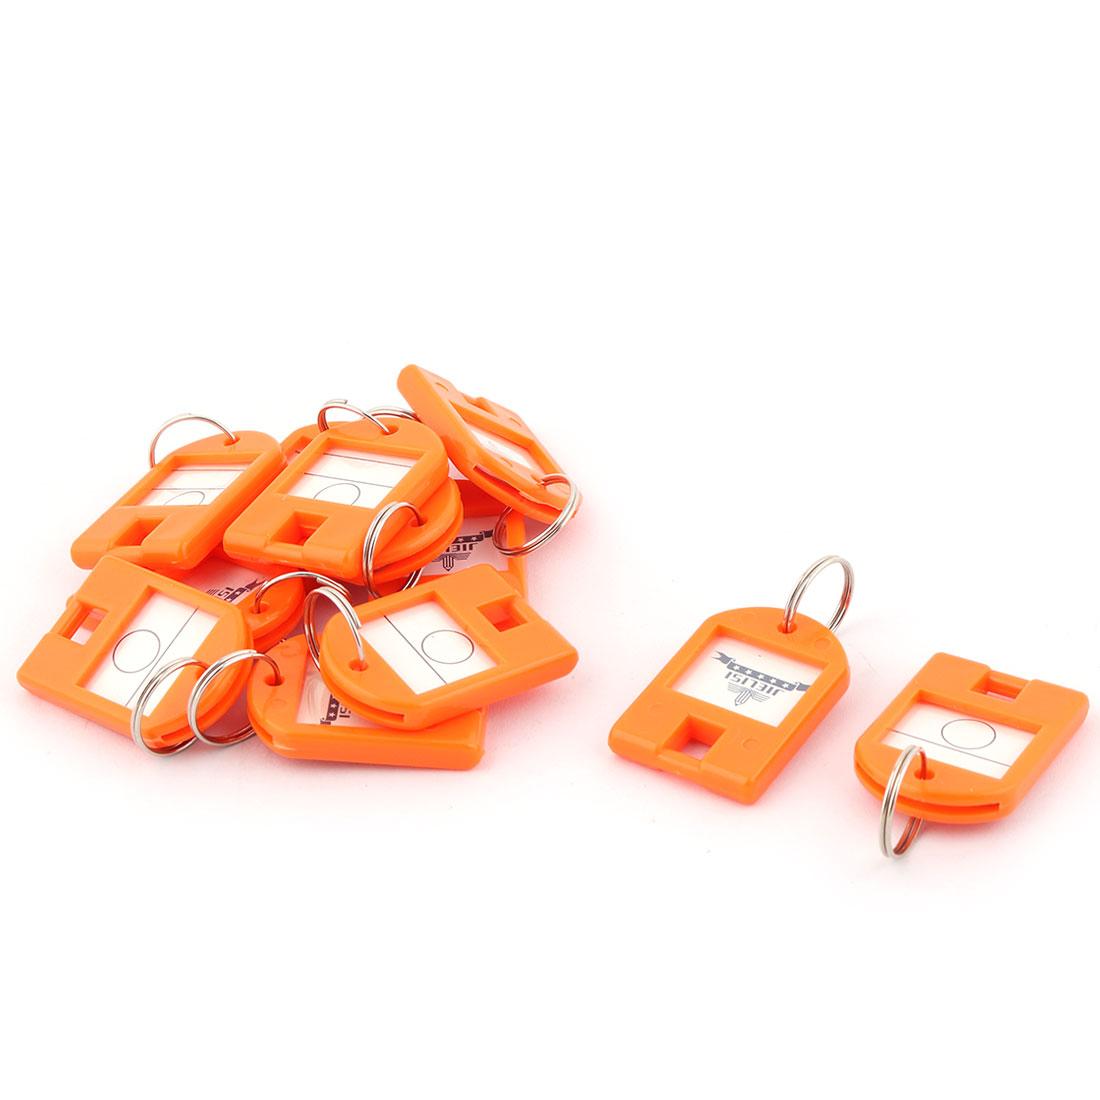 Plastic ID Label Name Mark Metal Ring Key Fobs Luggage Bag Keyring Orange 12pcs